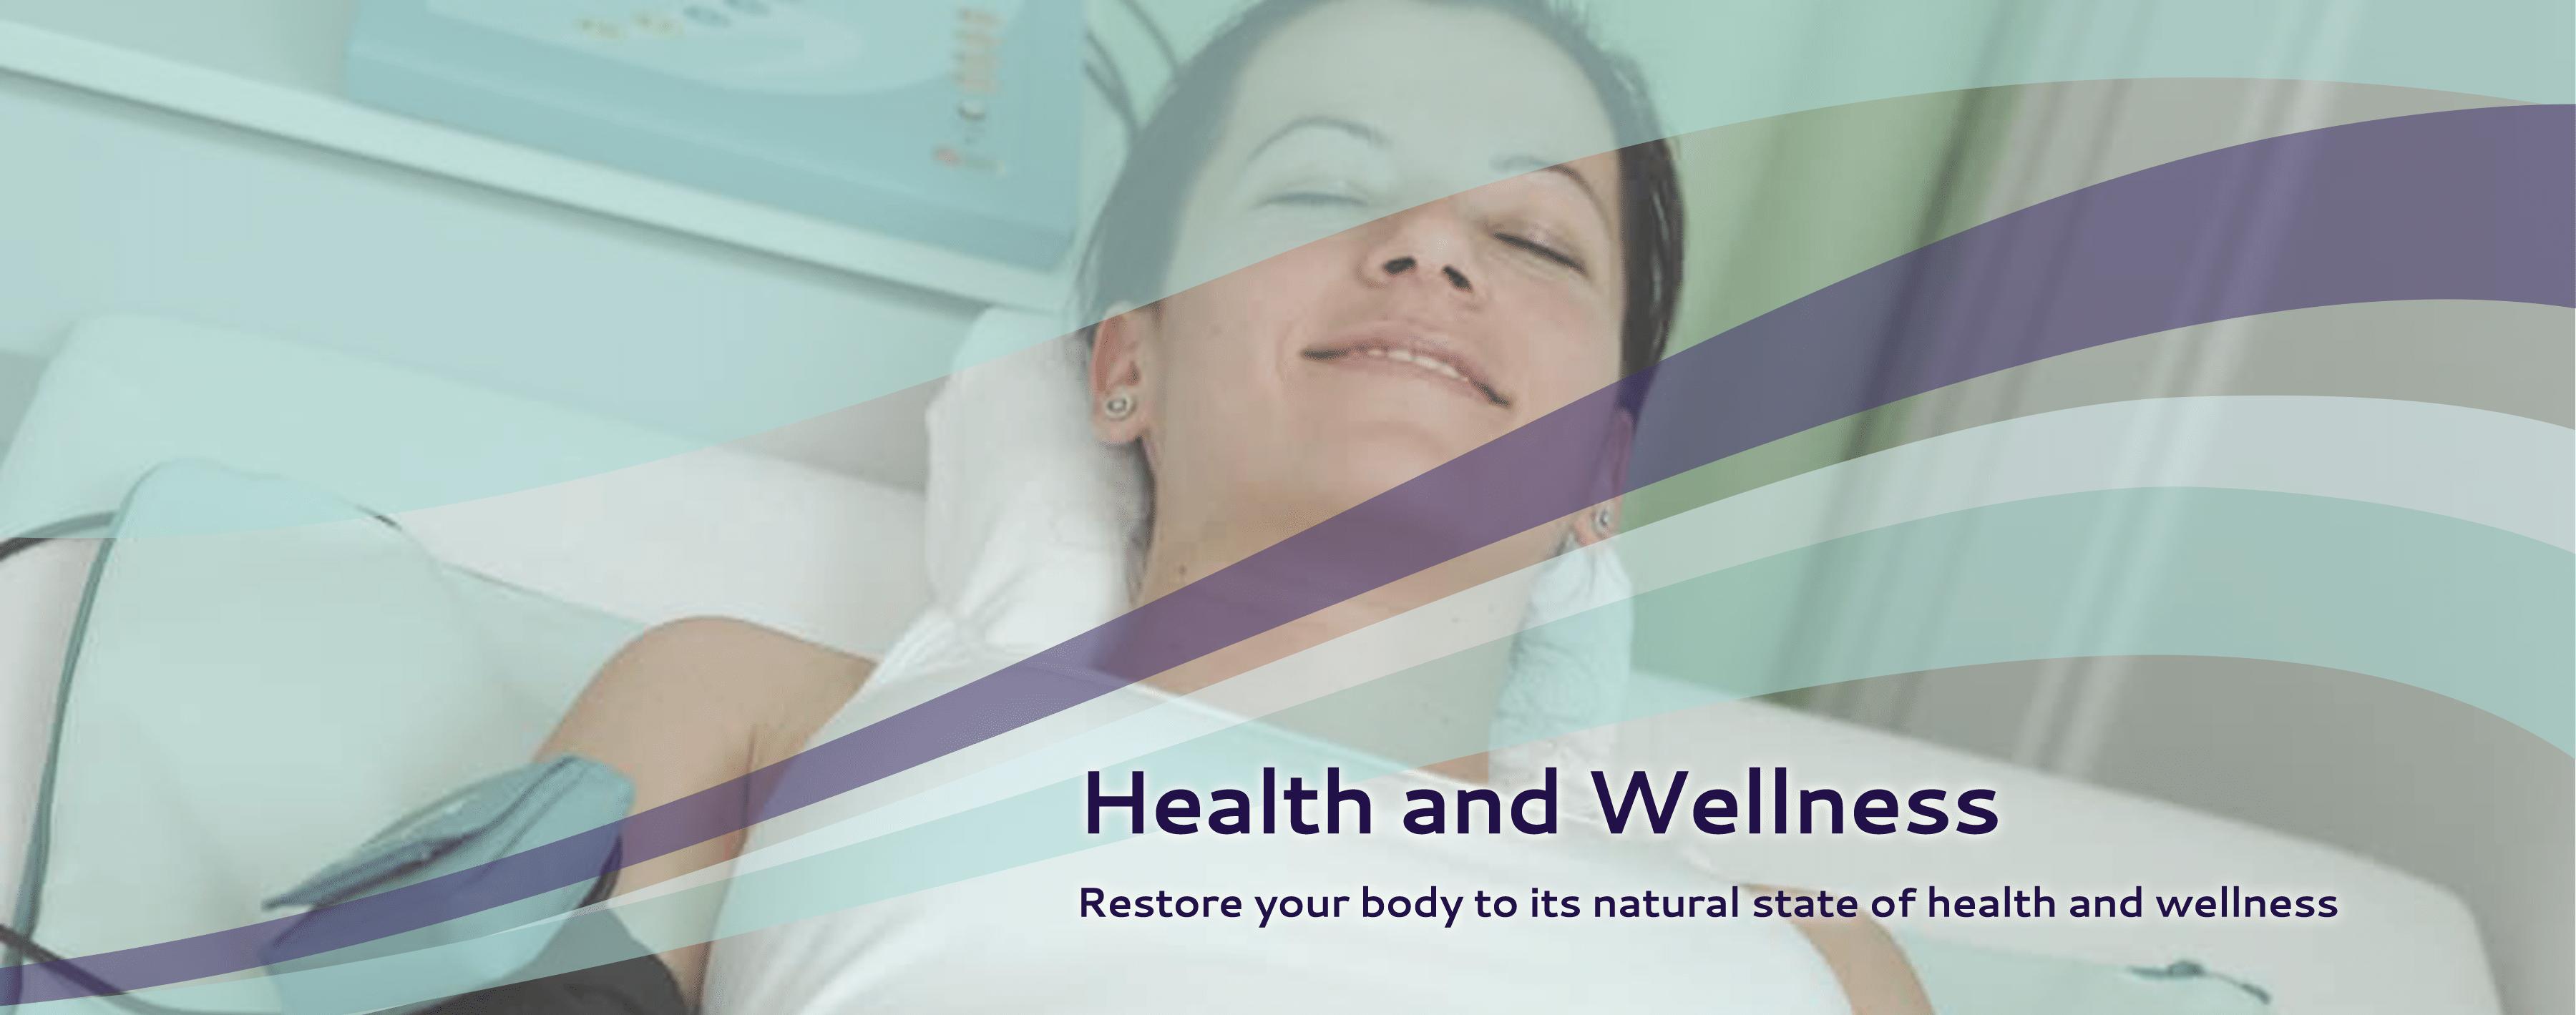 HealthandWellness